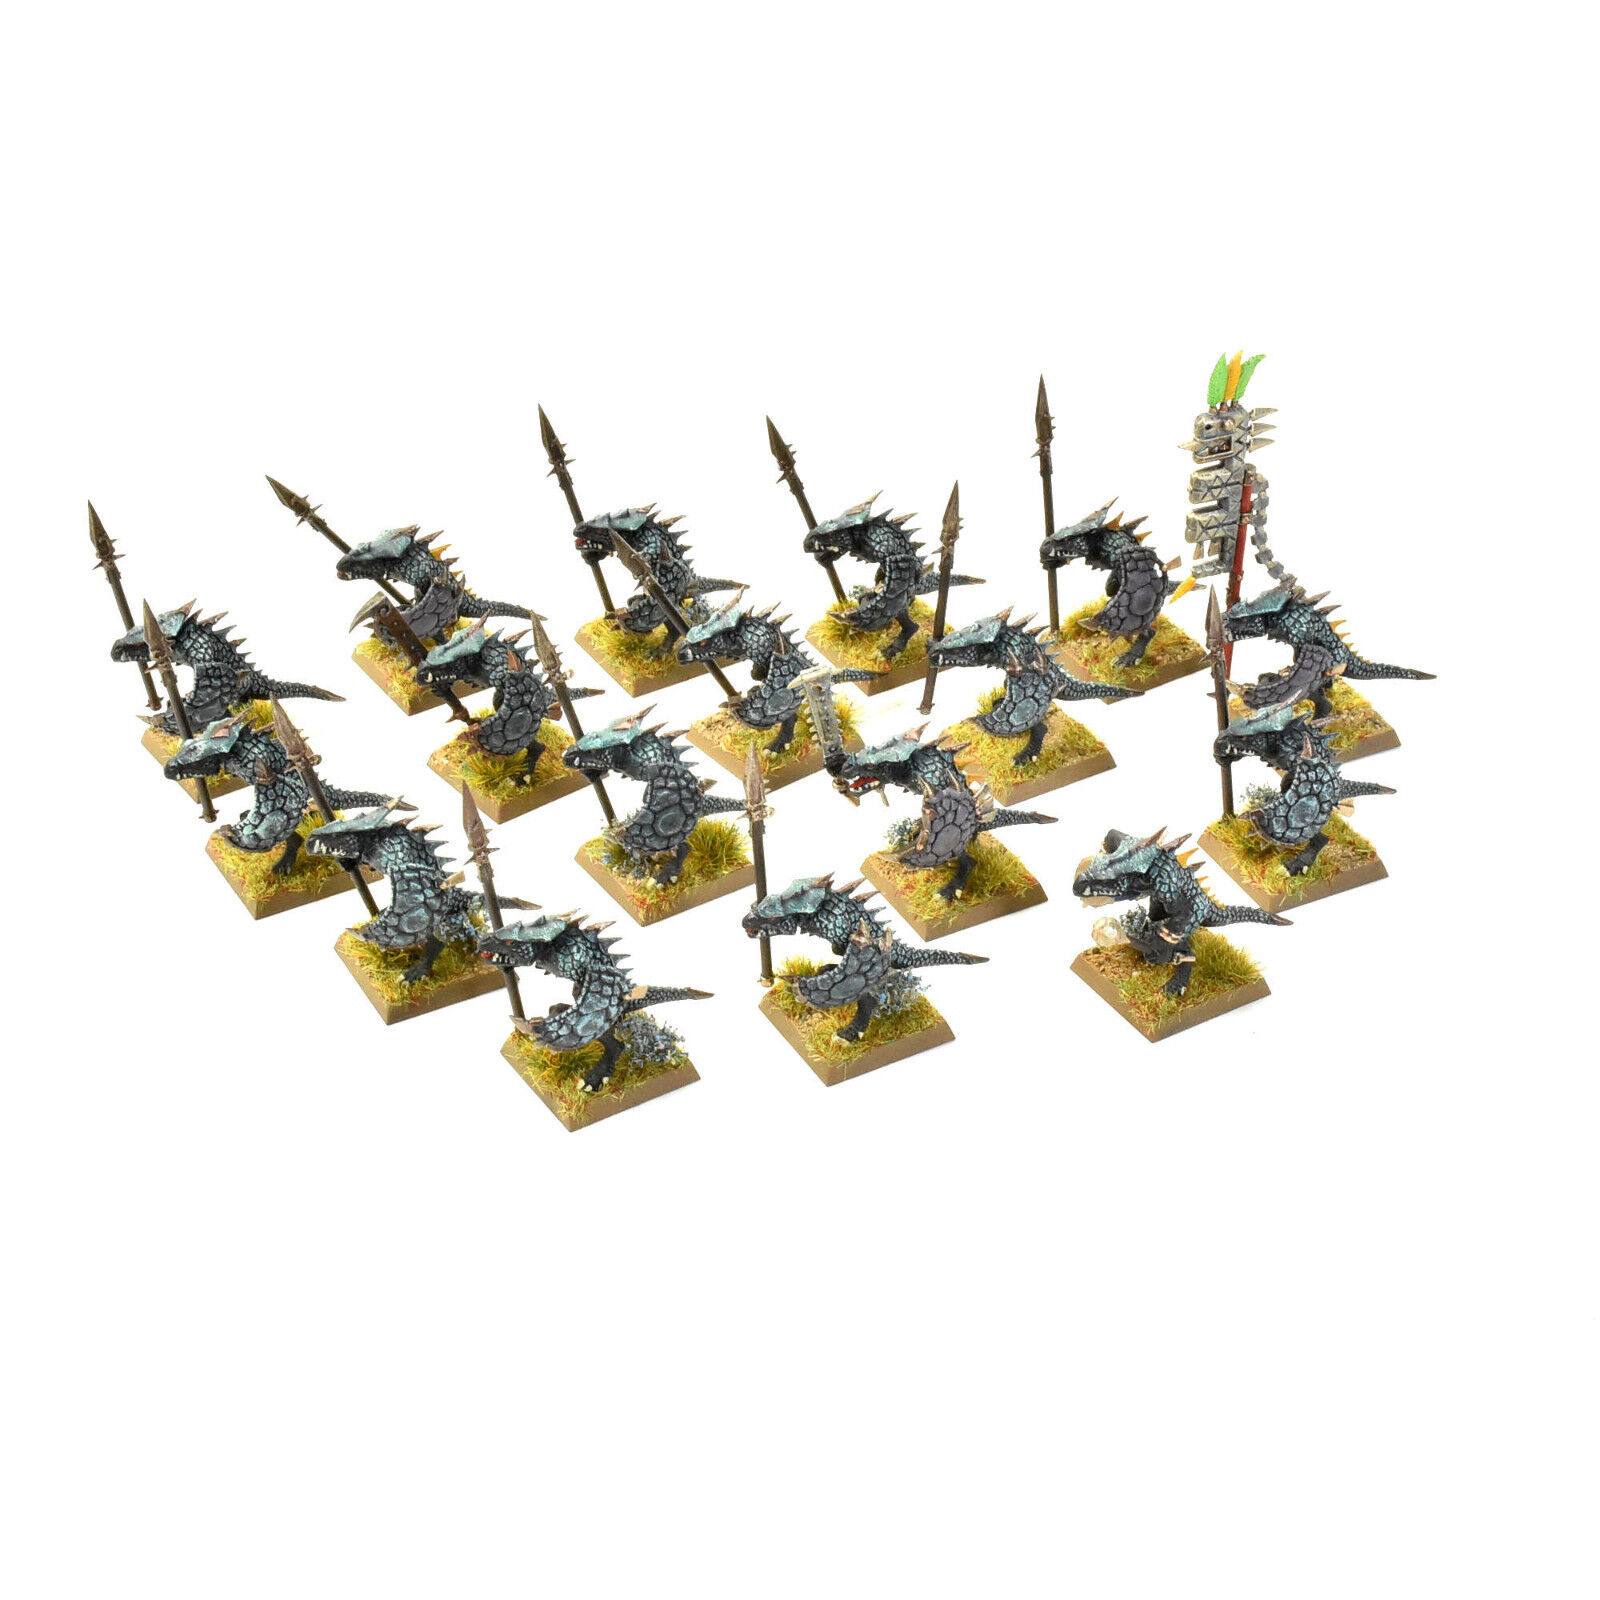 LIZARDMEN 16 Saurus warriors WELL PAINTED Warhammer Fantasy Seraphon